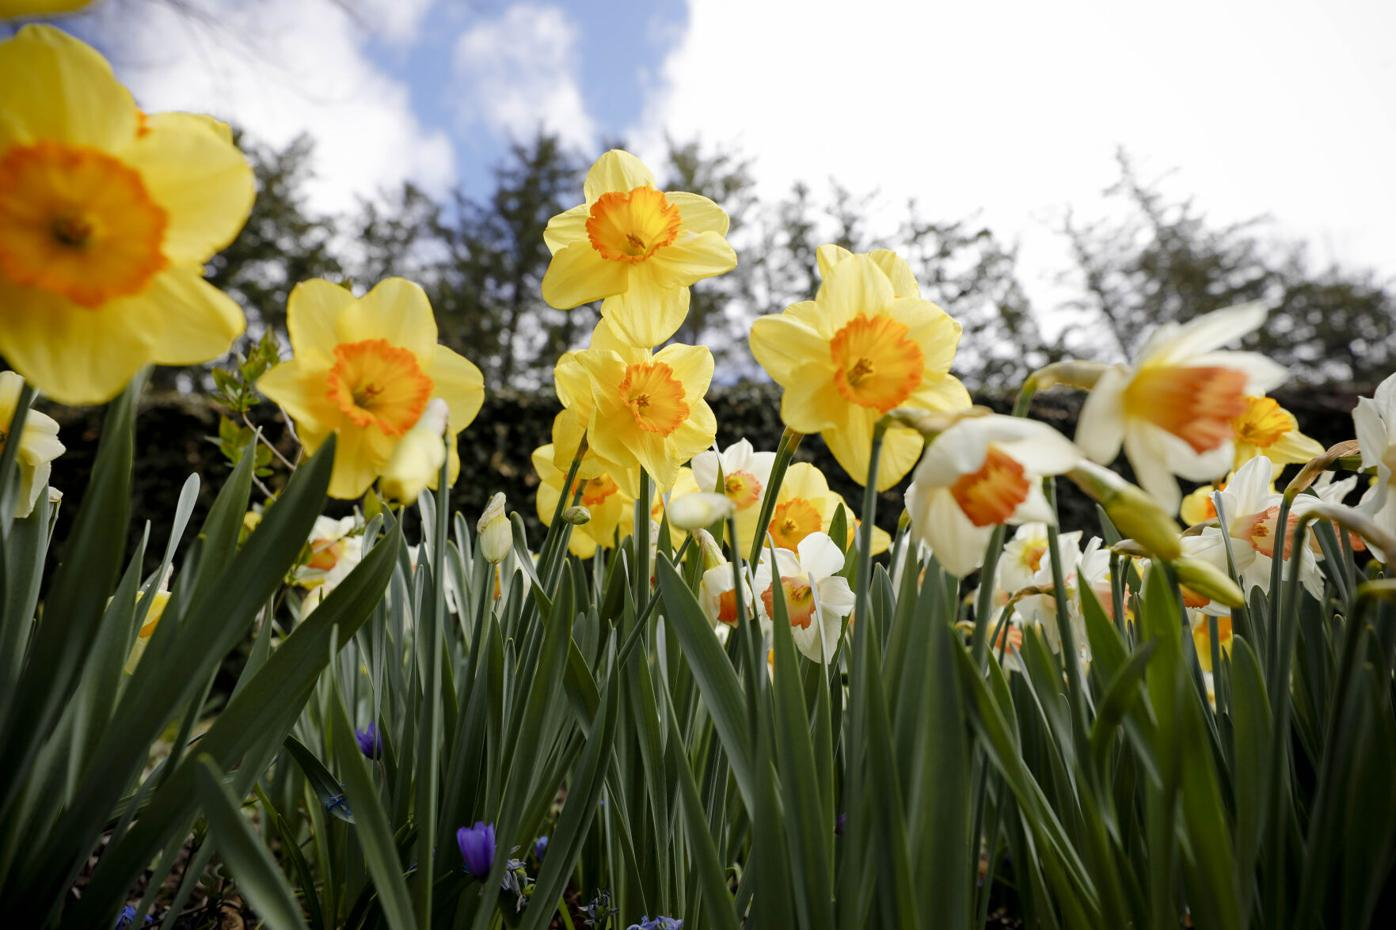 Naumkeag Daffodil Festival Preview